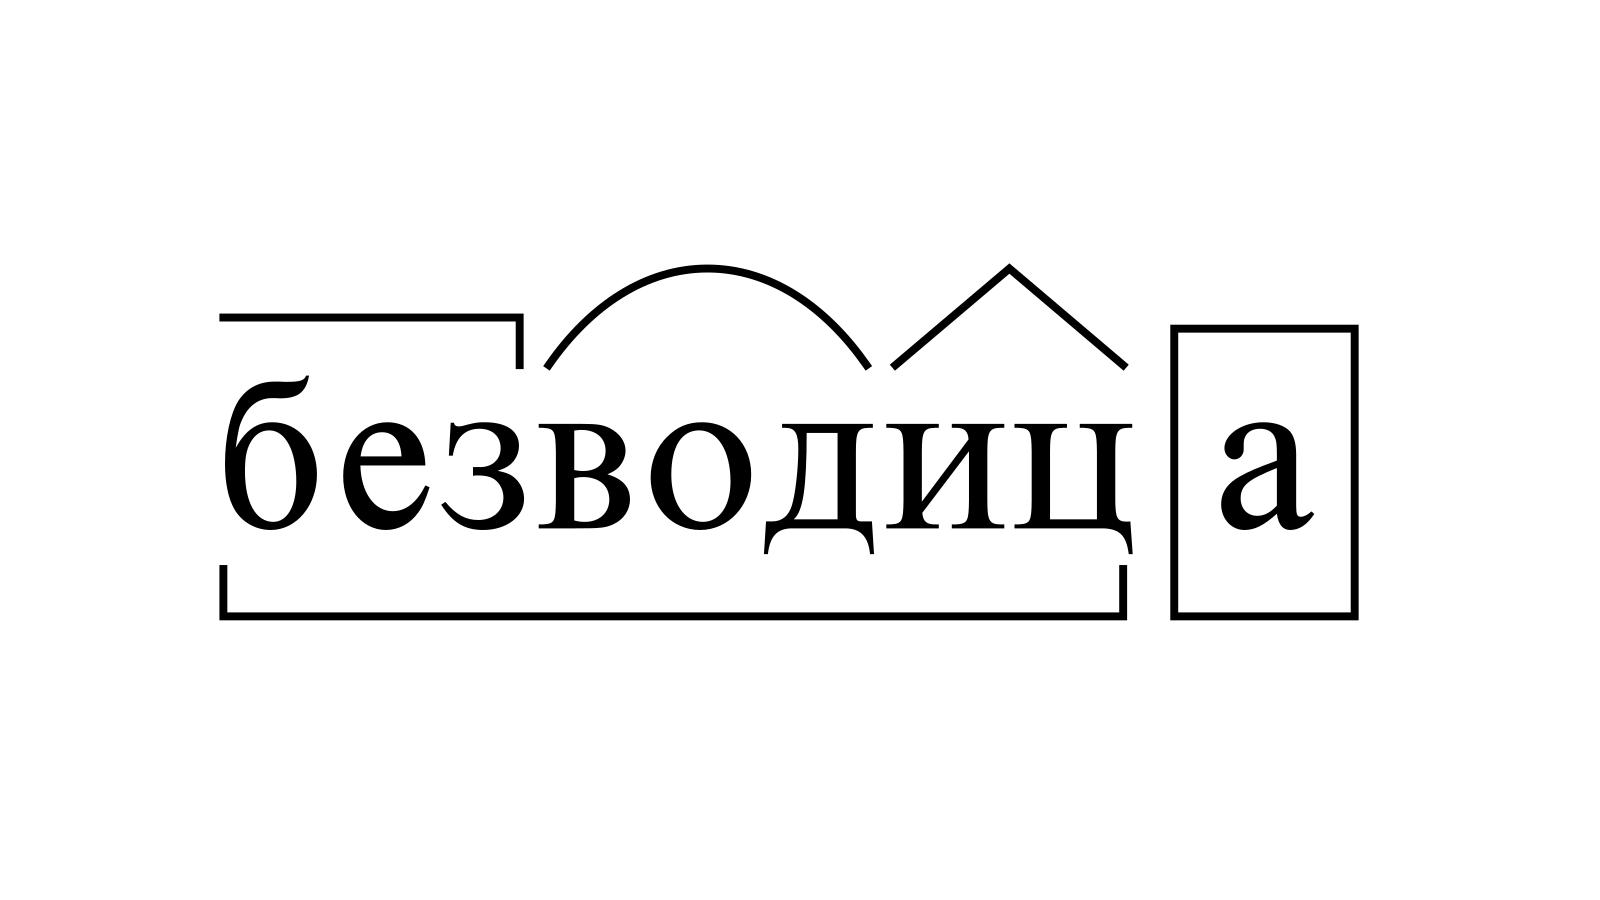 Разбор слова «безводица» по составу